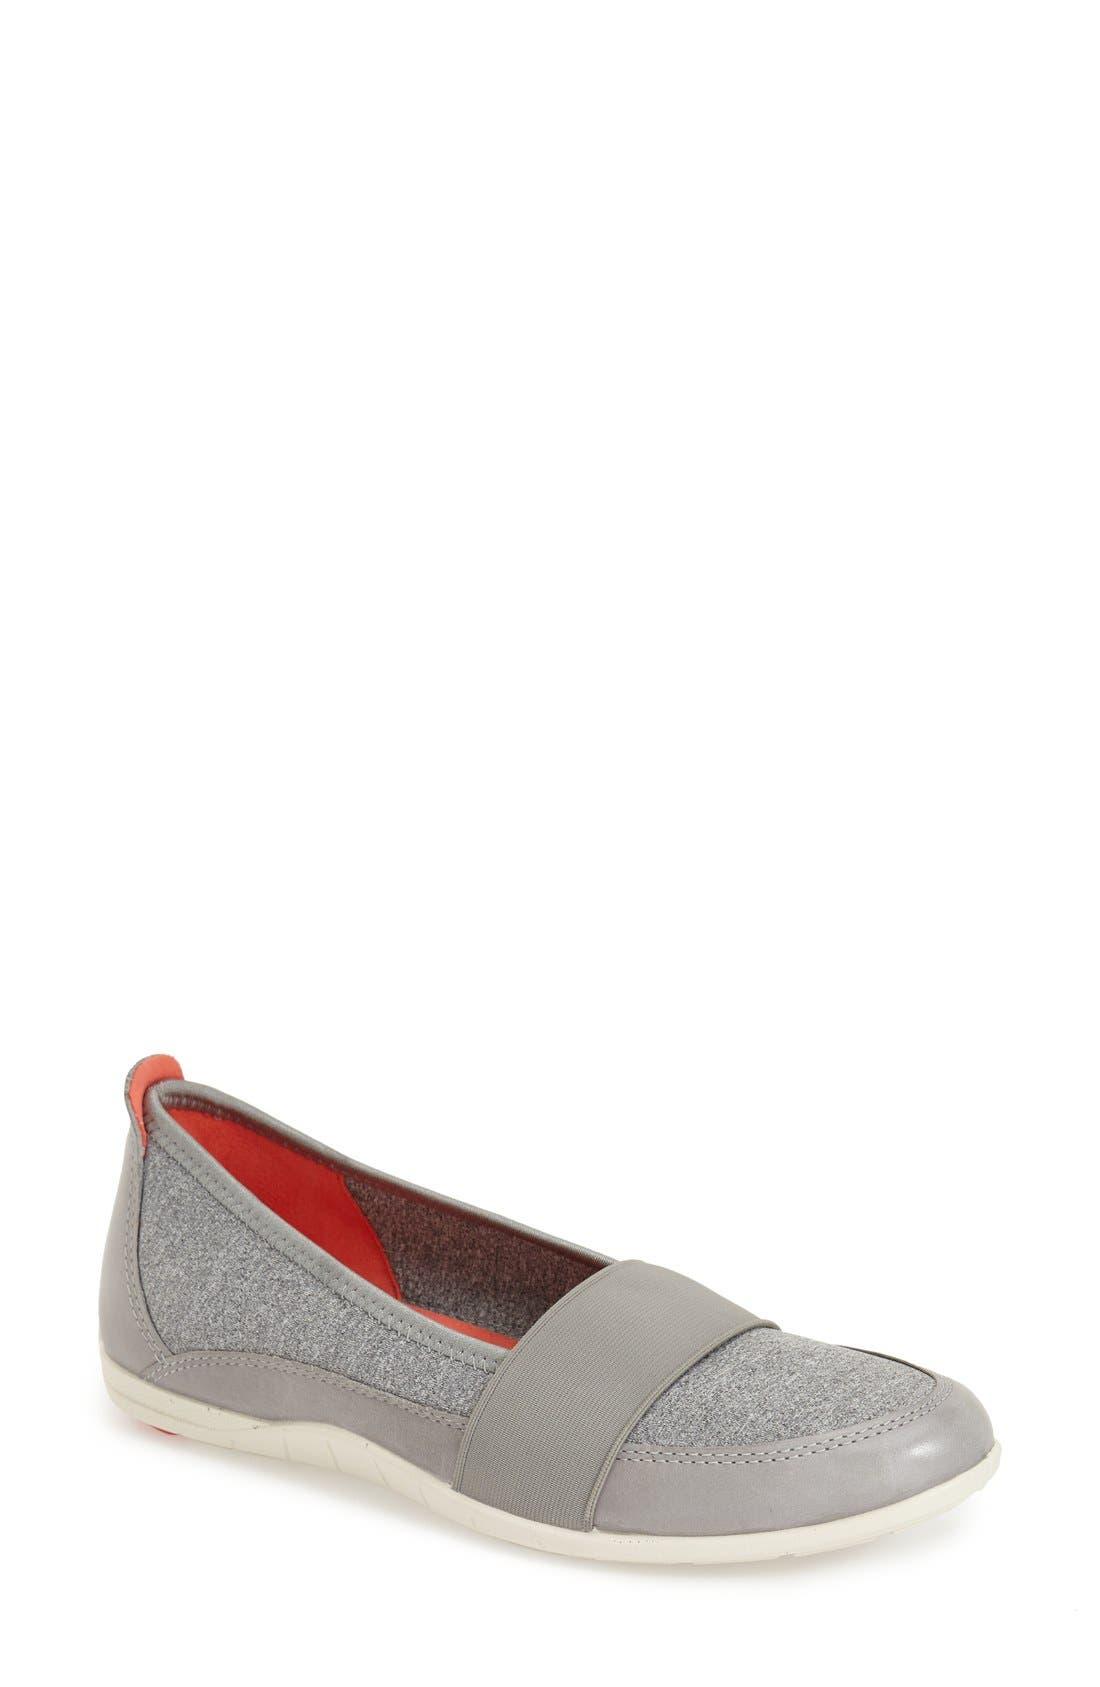 'Bluma' Slip-On Sneaker,                             Main thumbnail 5, color,